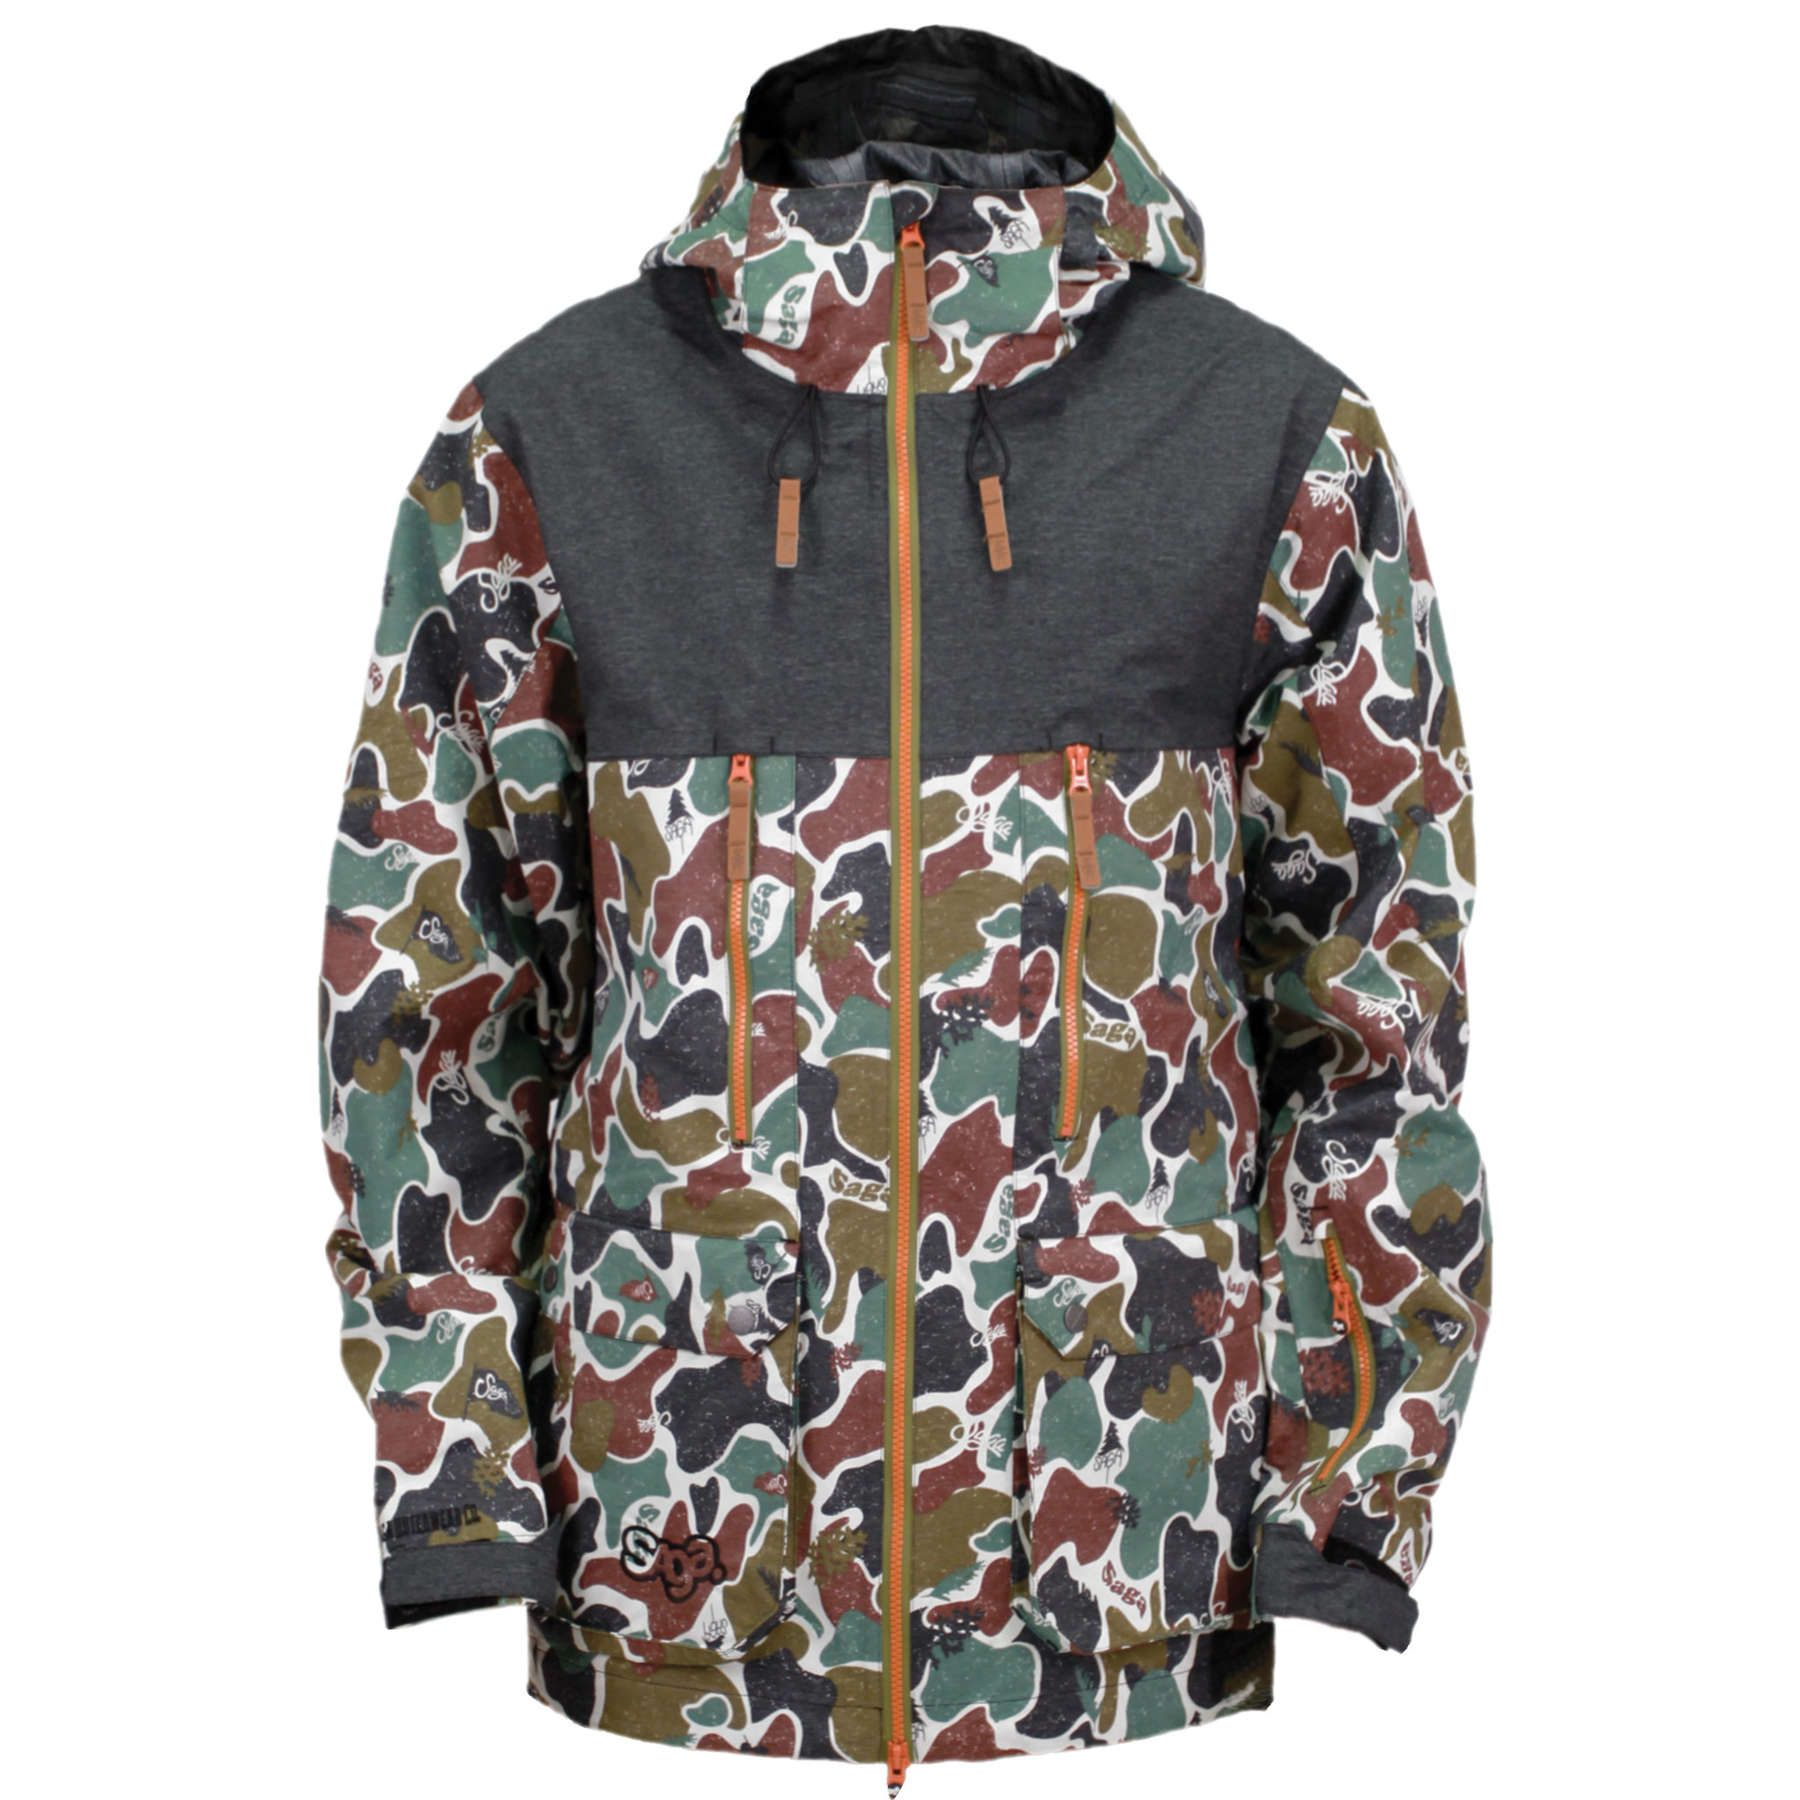 Saga Monarch 3l Jacket Jackets Snowboard Jacket Fashion [ 1800 x 1800 Pixel ]